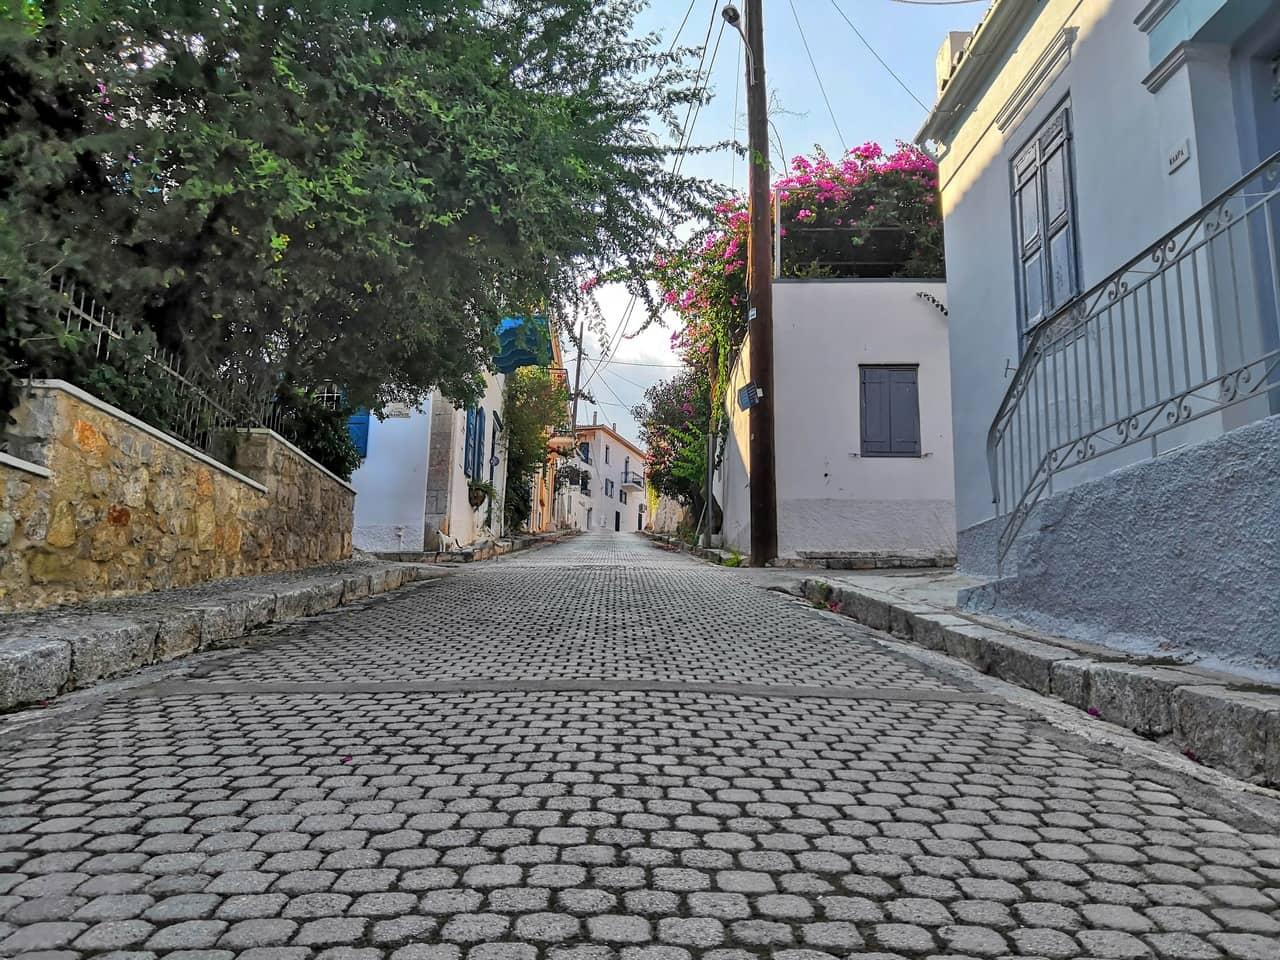 Ascending village stone road